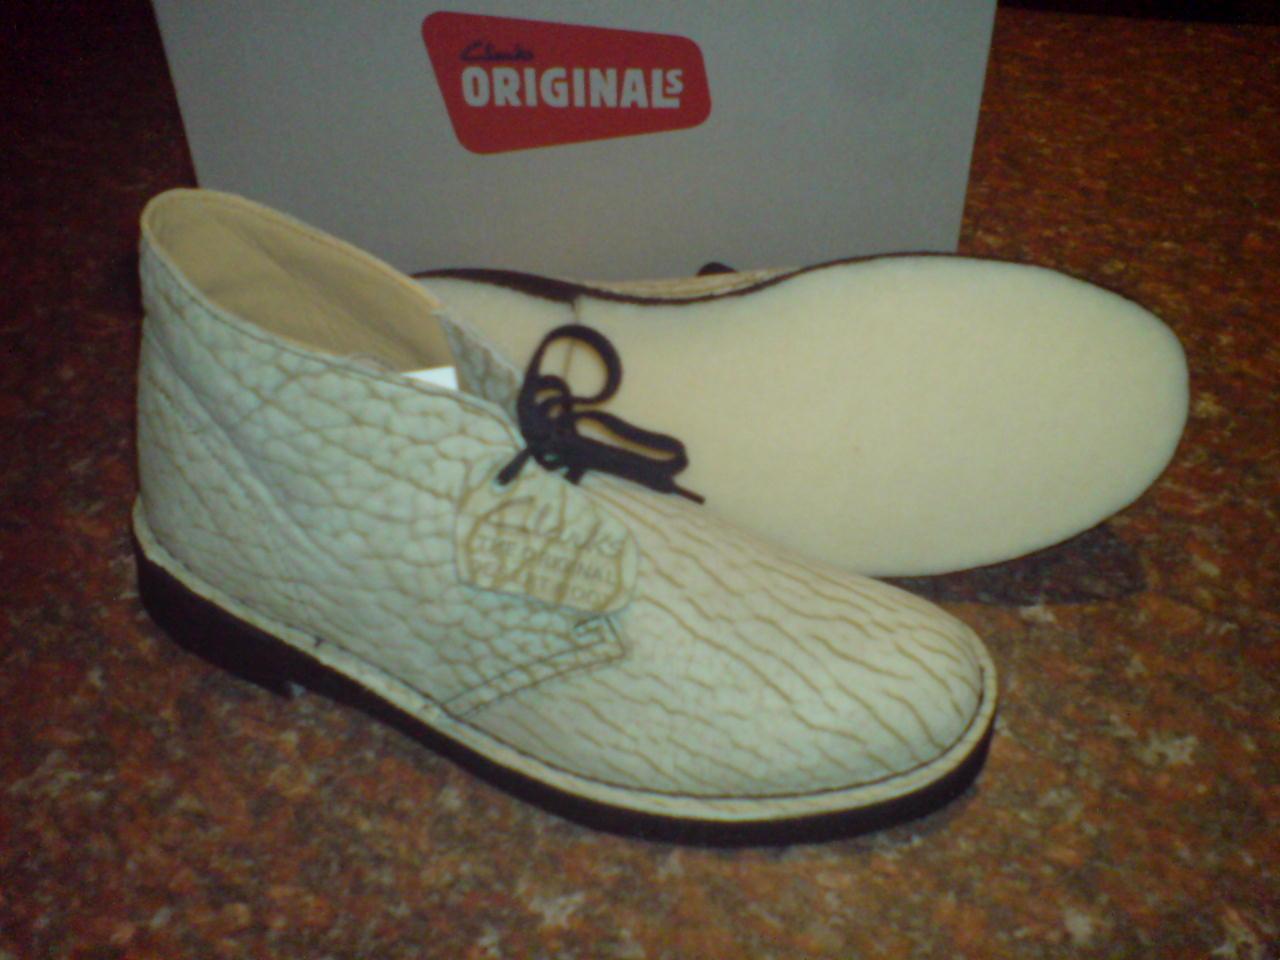 NUOVE Clarks Original Boots Uomini ** Desert Boots Original Pelle Nabuk Foglia Uva ** ** F 803c4a